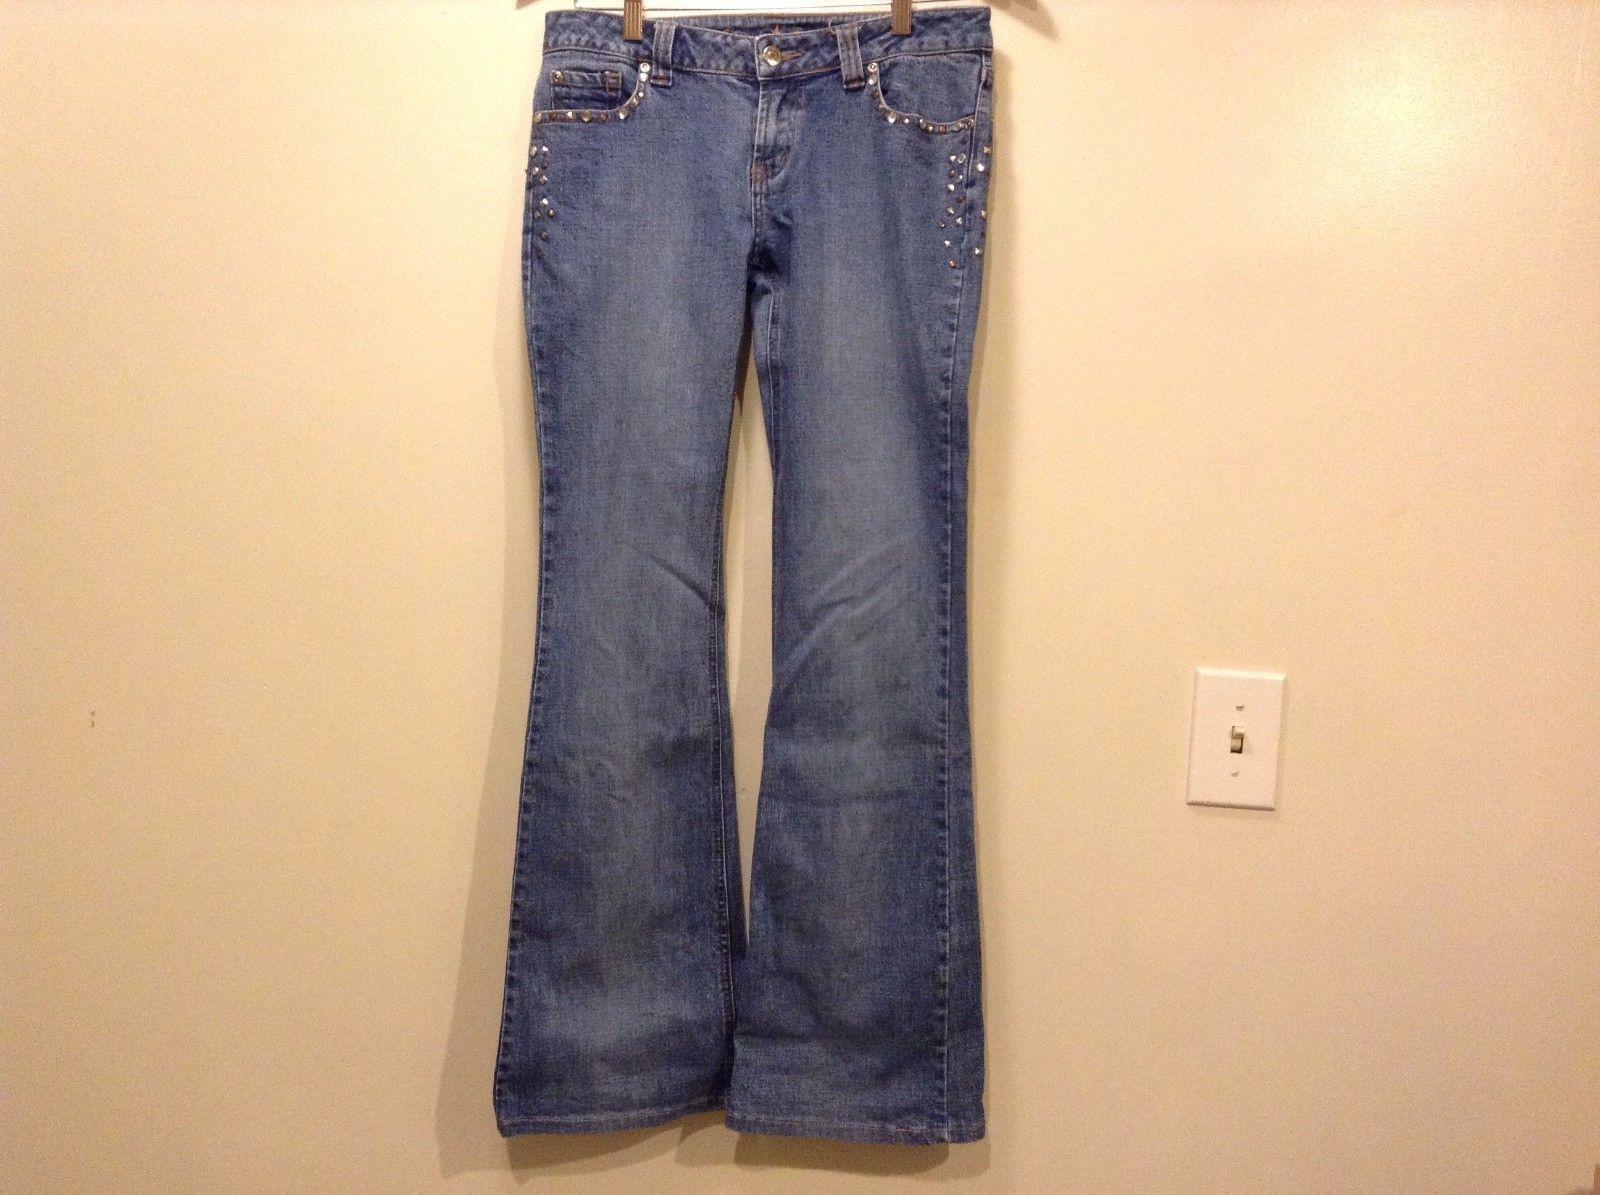 Great Condition Arizona Jeans Blue Denim Zipper Button 4 Pockets Studded